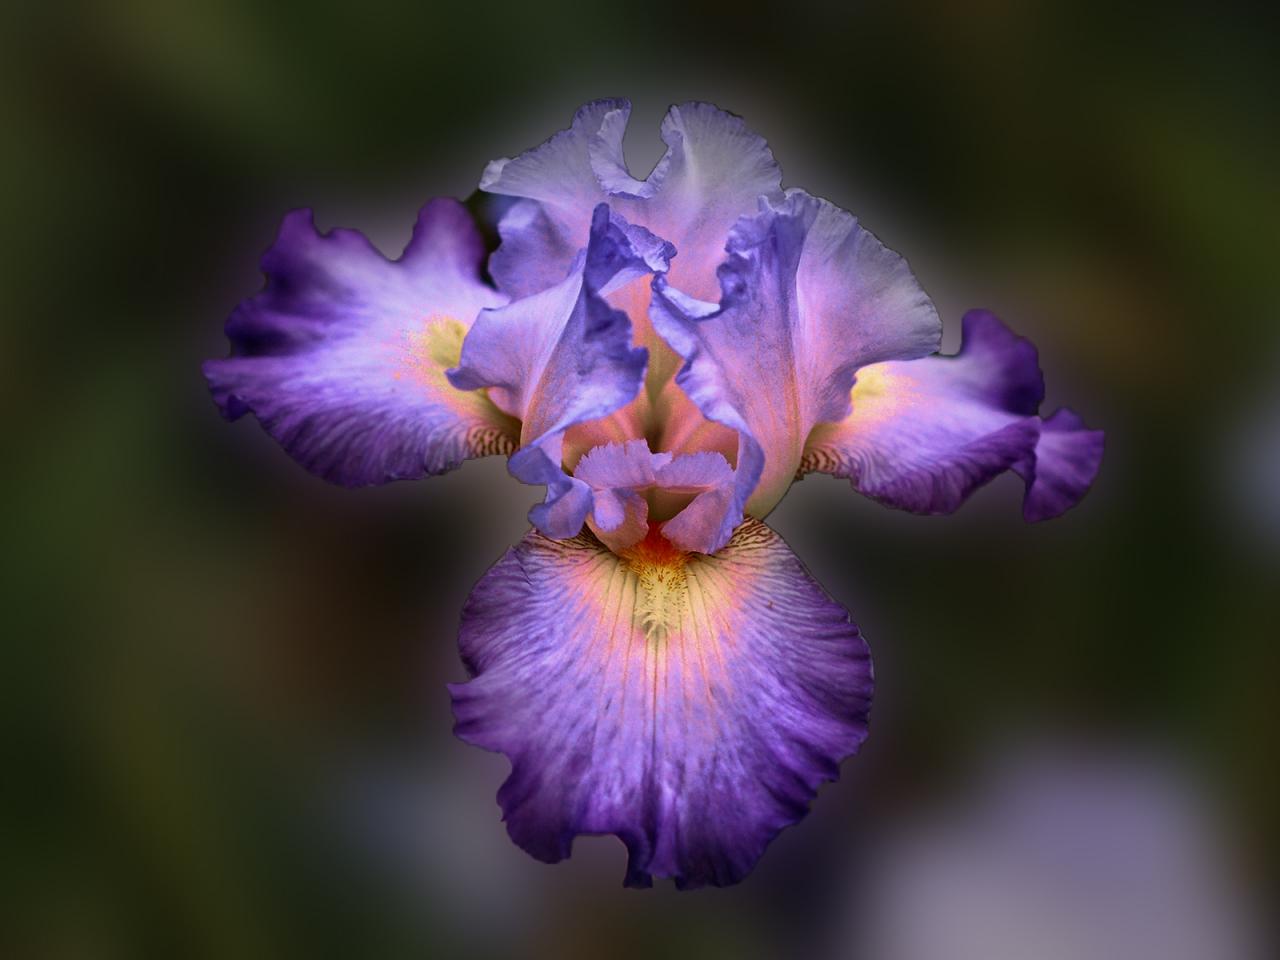 Bella flor purpura - 1280x960